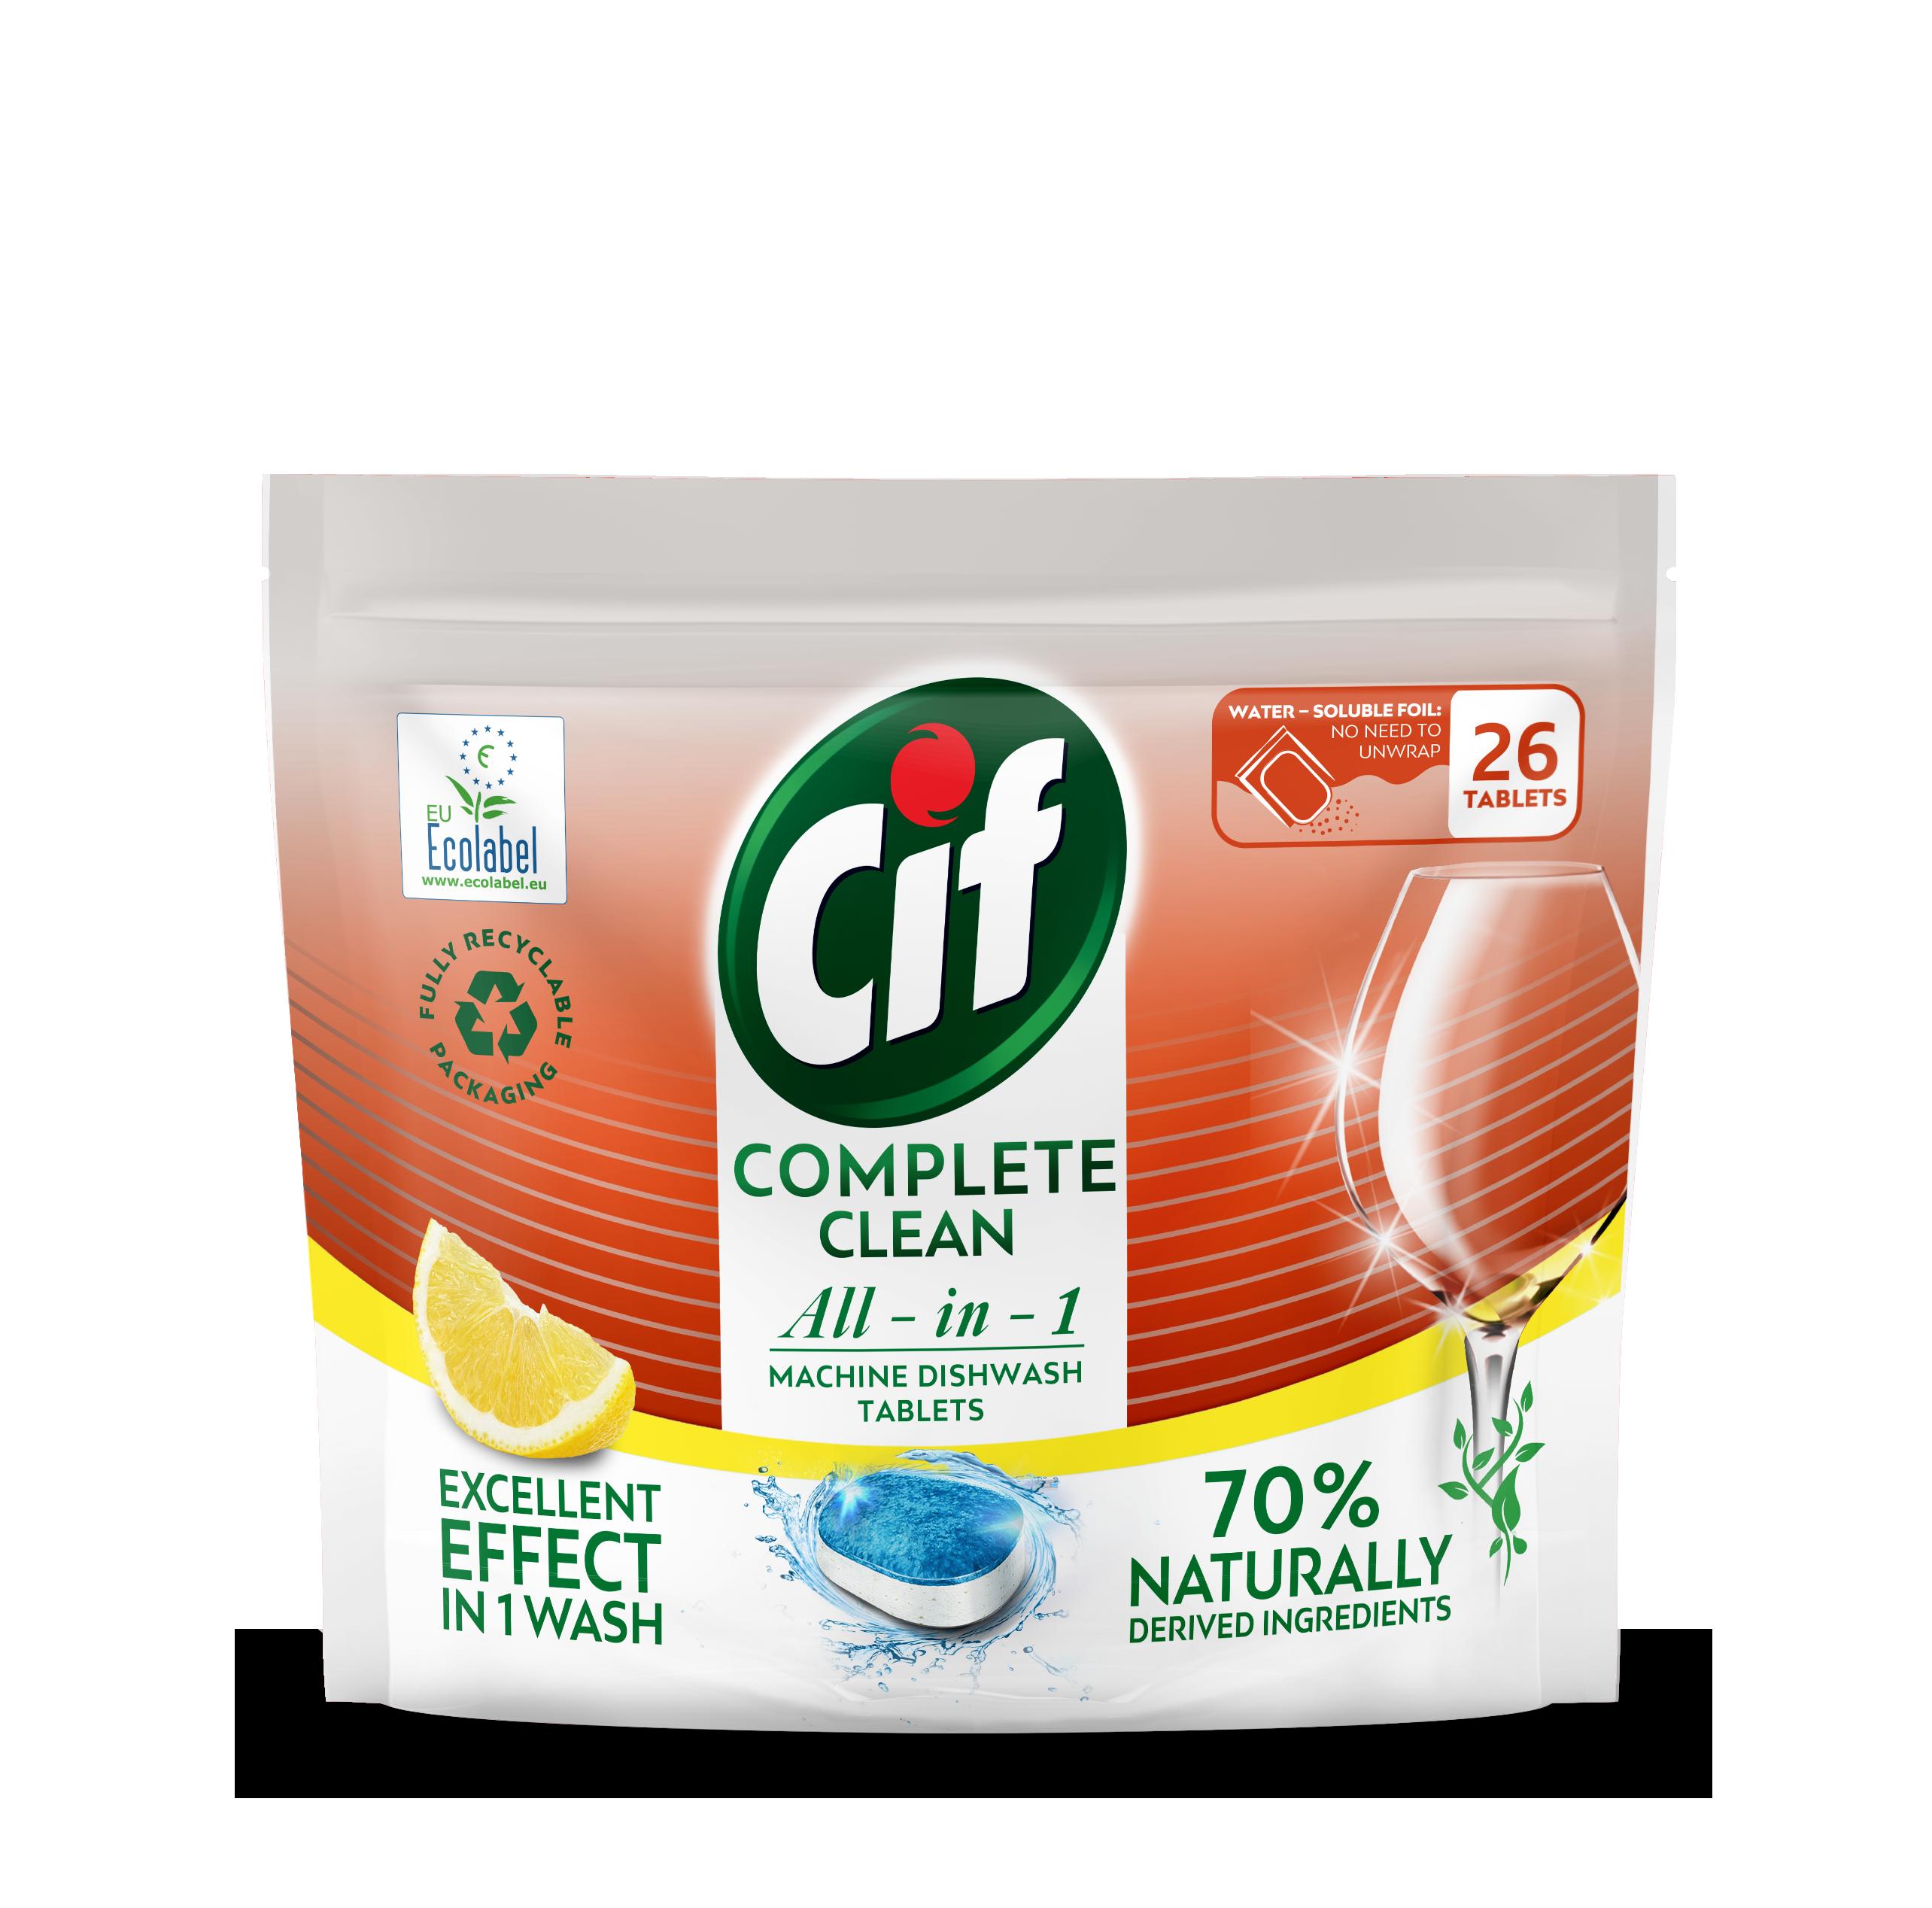 Cif tablety do myčky All-in-1 Citrus 26 ks/bal.